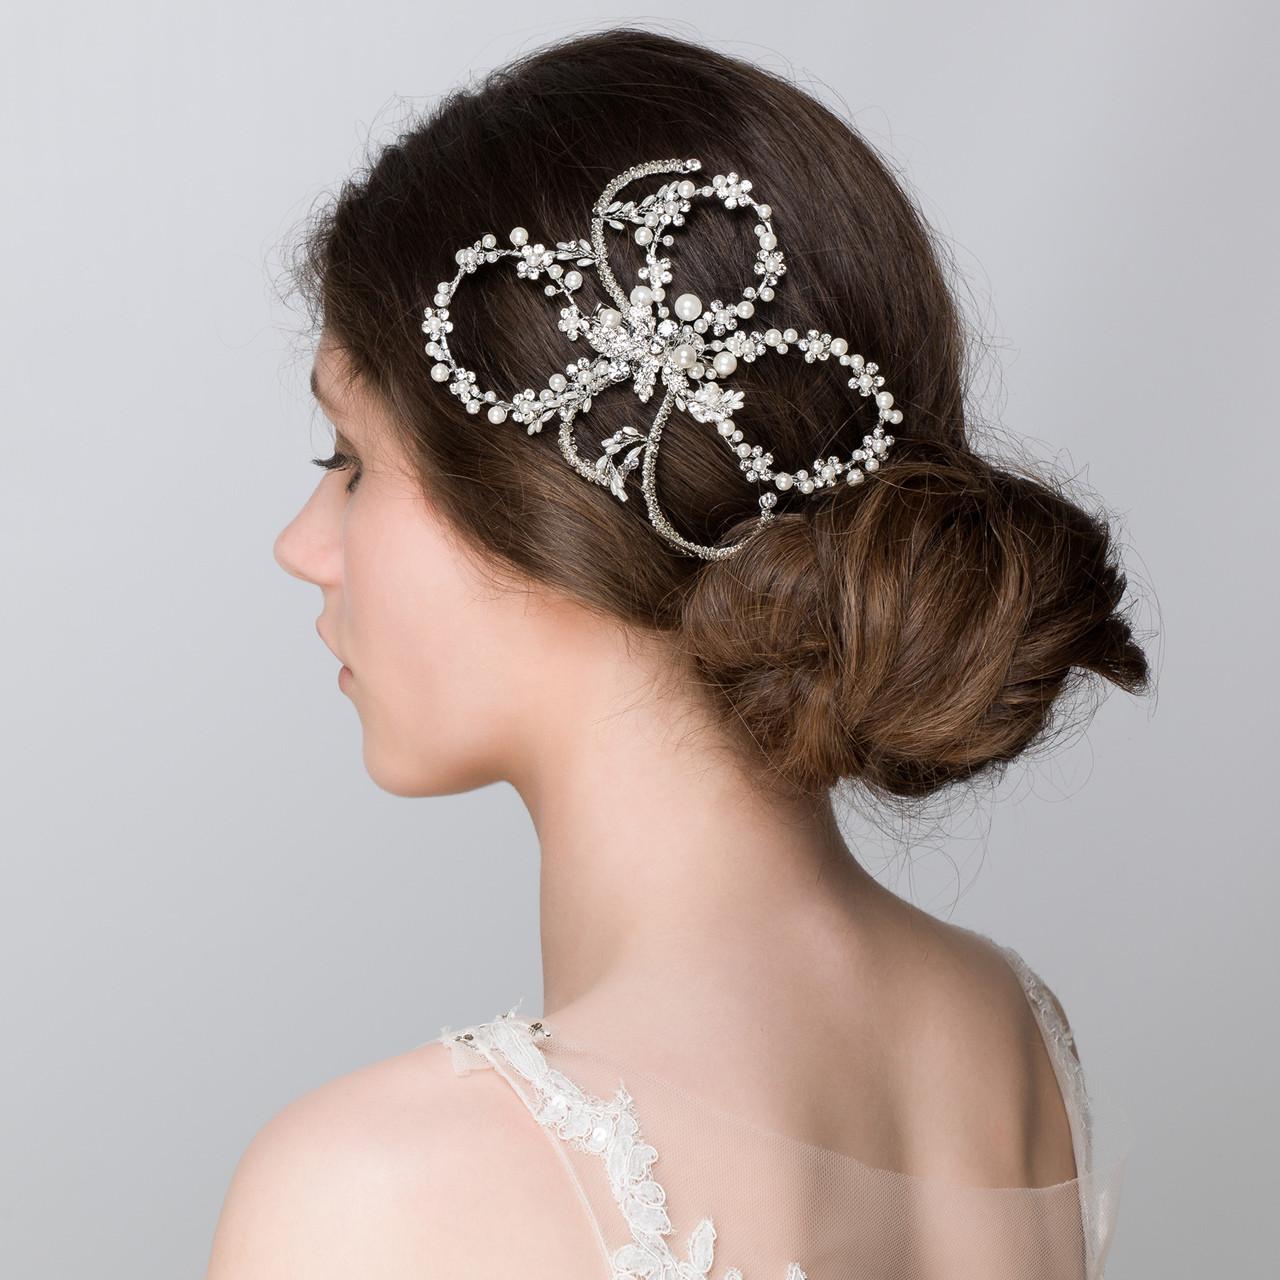 Olivia Large Bridal Flower Hair Clip | Pearls Wedding Accessories | Lily Luna Edinburgh Scotland